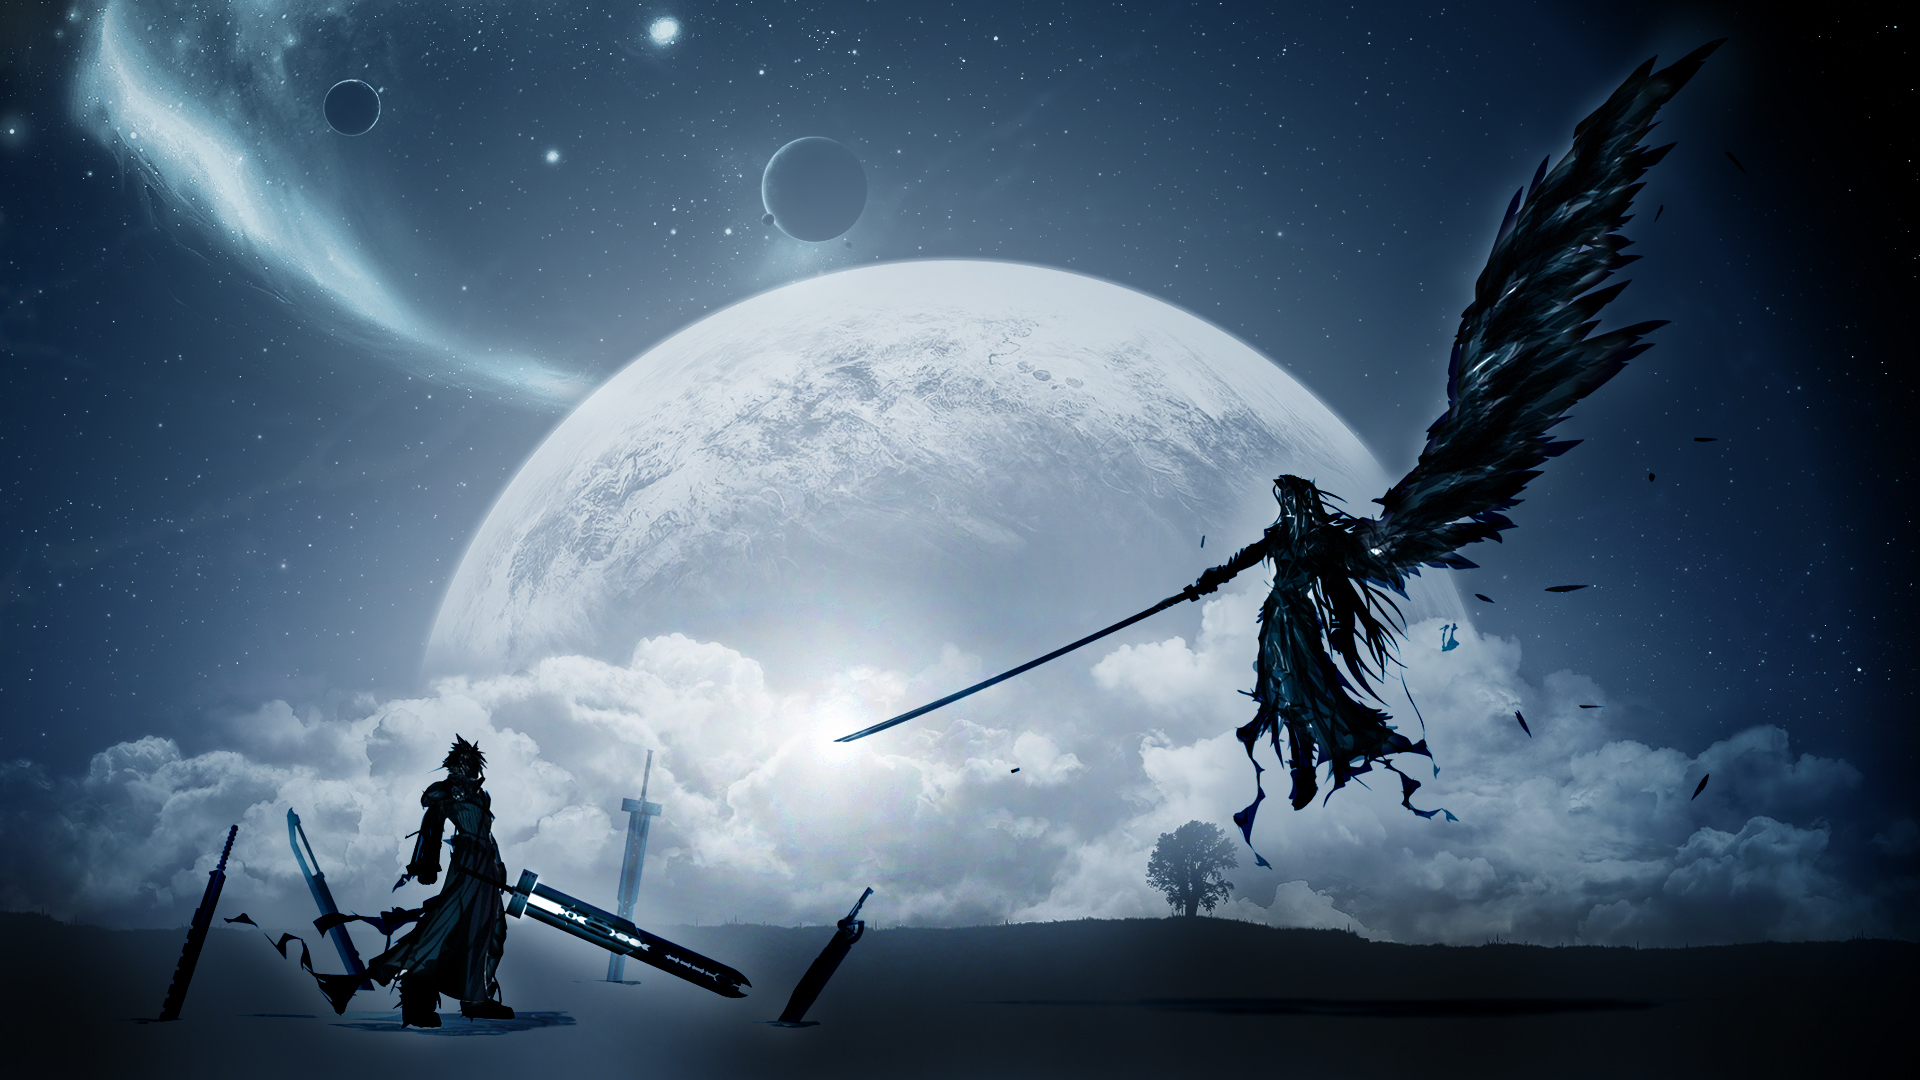 Jeux Vido   Final Fantasy Vll TerreNature Fantaisie Final Seven Ff7 1920x1080